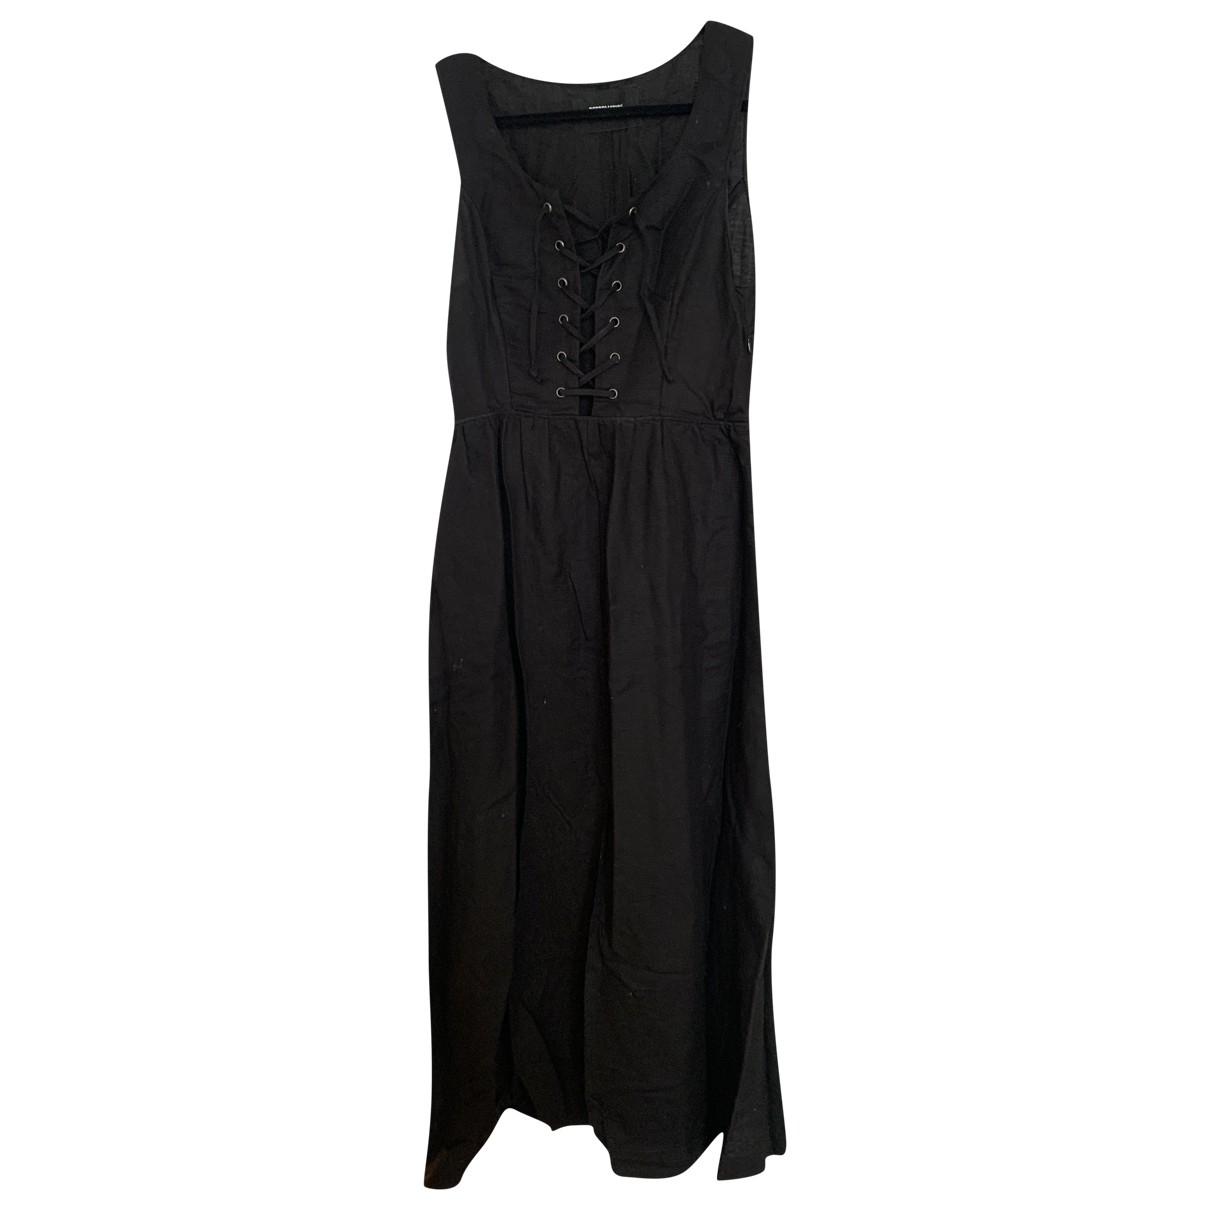 Reformation \N Black Linen dress for Women 4 US